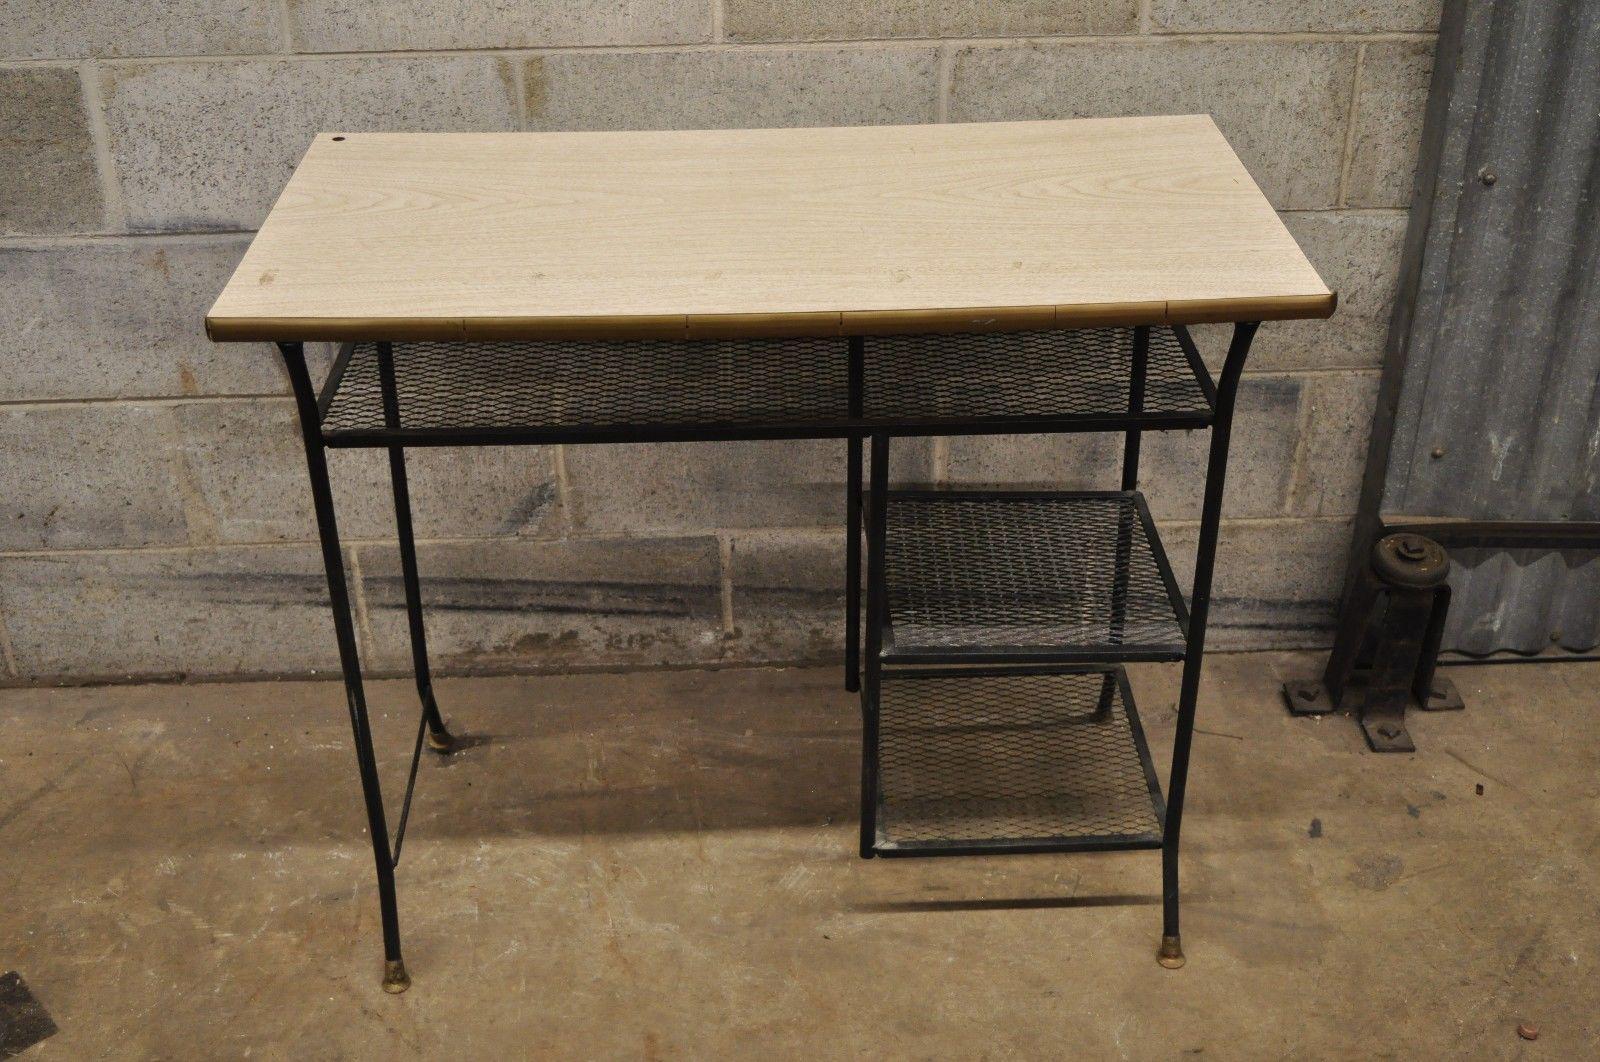 Industrial Vintage Mid Century Modern Wrought Iron U0026 Metal Mesh Small  Writing Desk Work Table